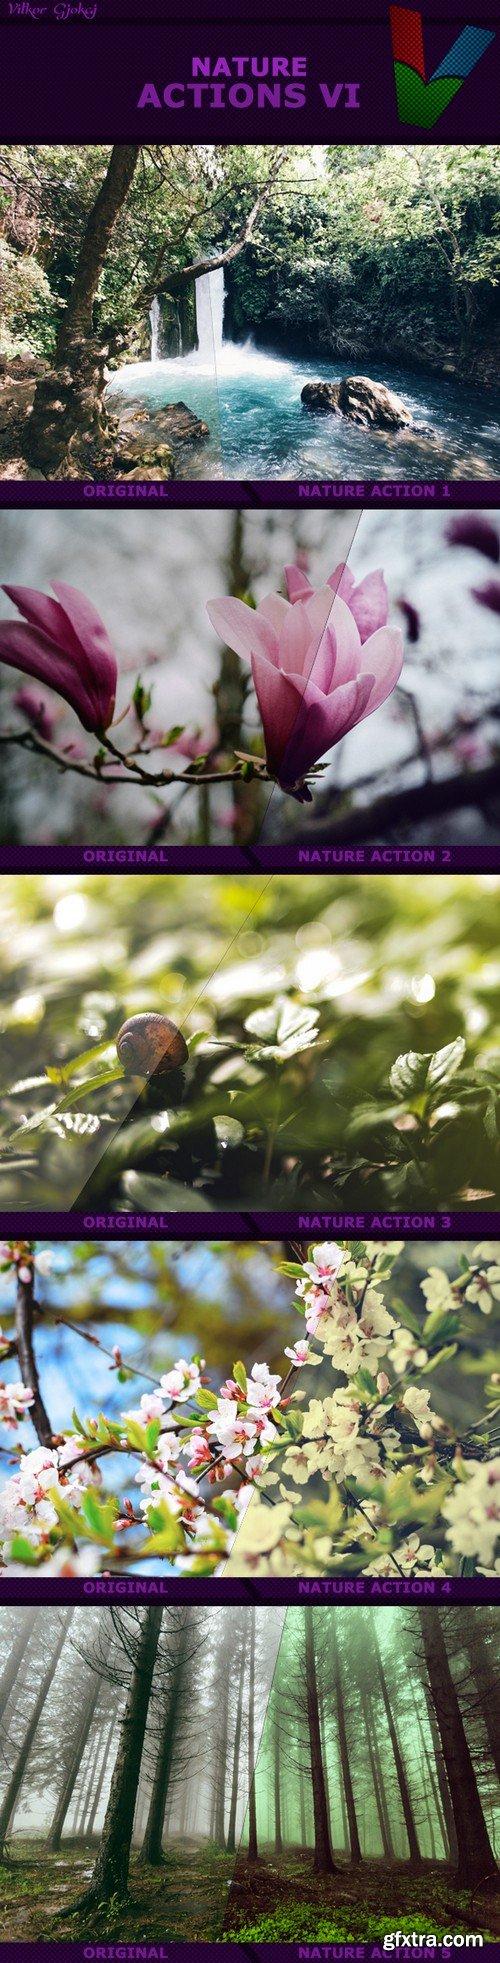 Graphicriver - Nature Actions VI 16657664